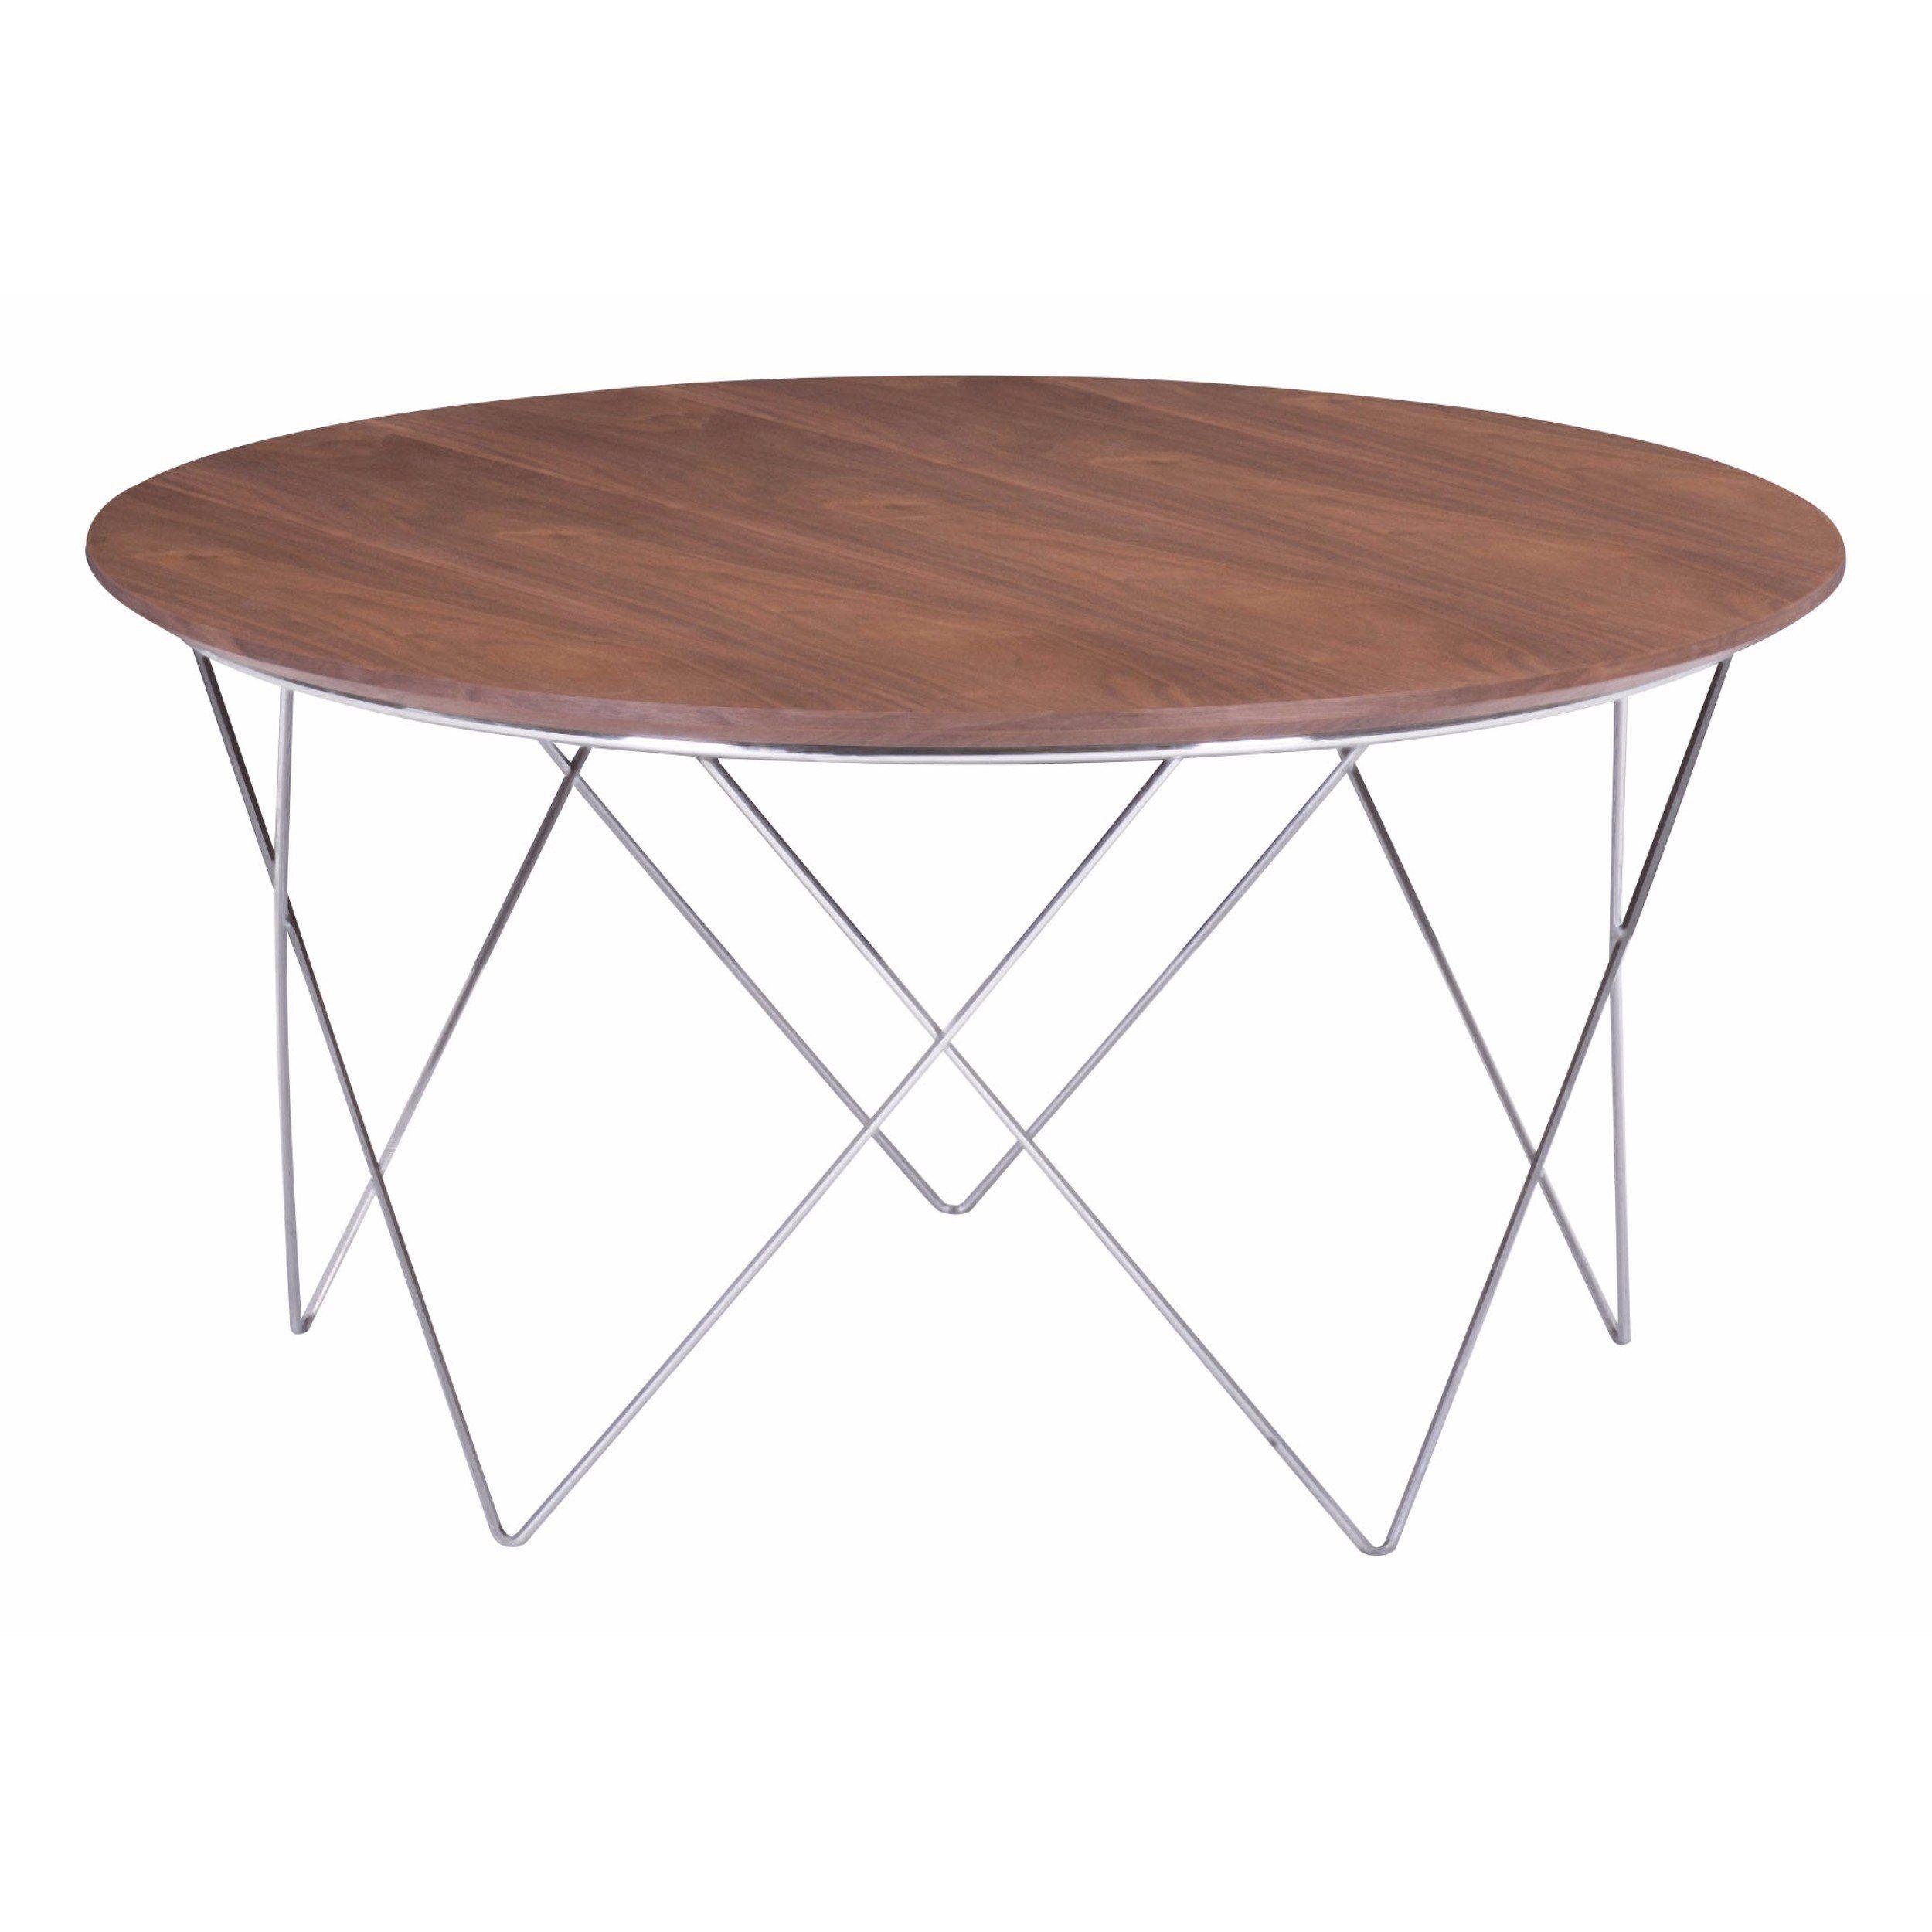 Mmacho Coffee Table Walnut Coffee Tables Accent Tables Furniture Modern Coffee Tables Walnut Coffee Table Round Wood Coffee Table [ 2500 x 2500 Pixel ]